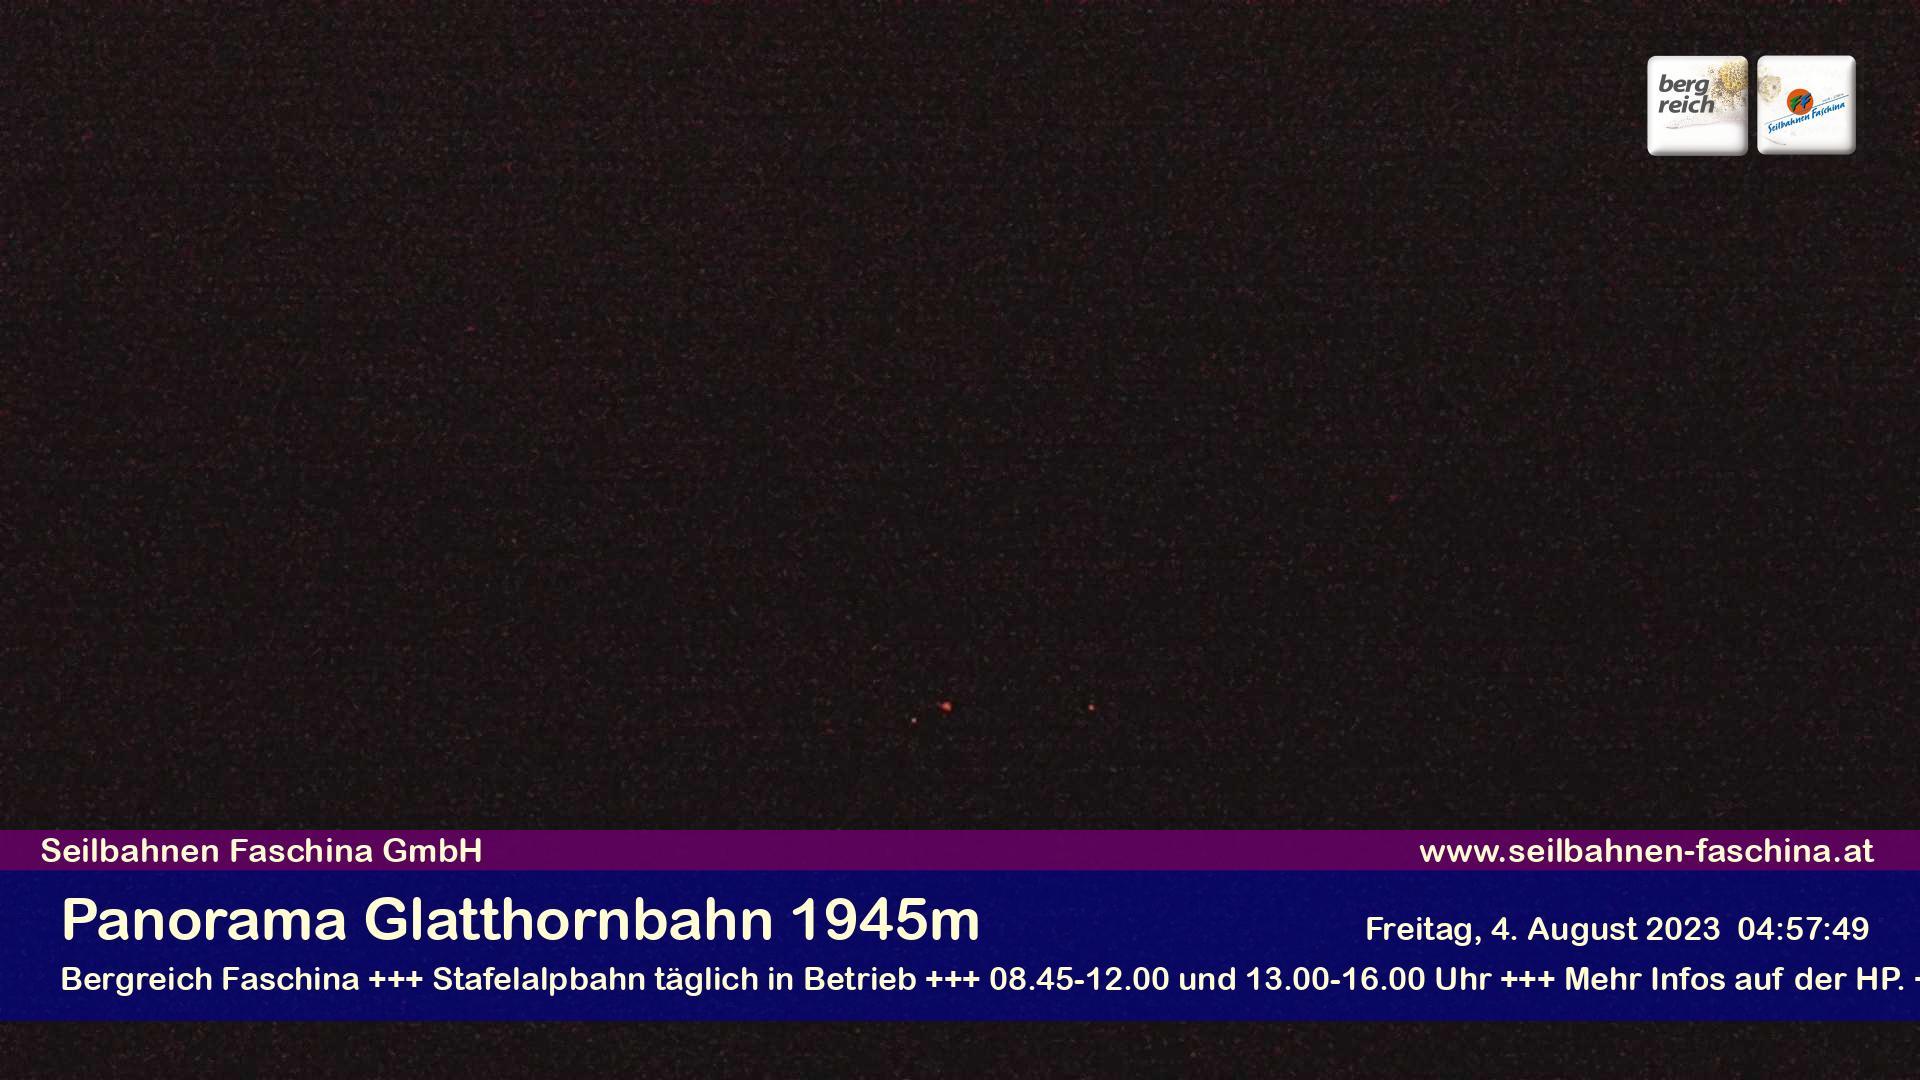 Faschina - Glatthornbahn